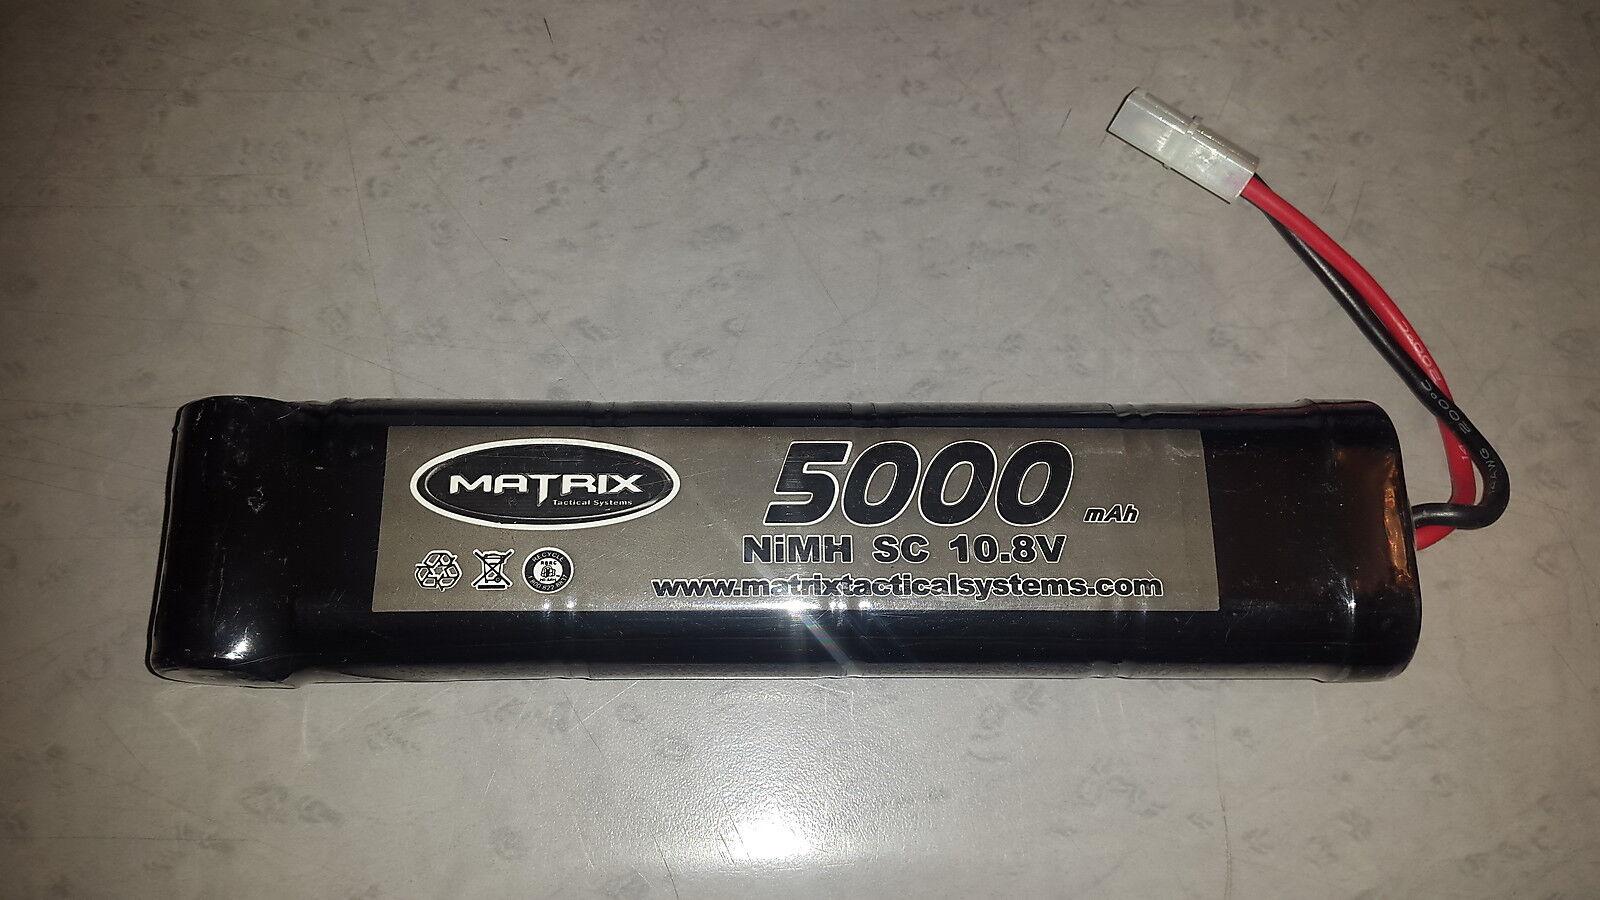 Batterie accus MATRIX 5000 mAh 10,8V NiMH SC NEUF